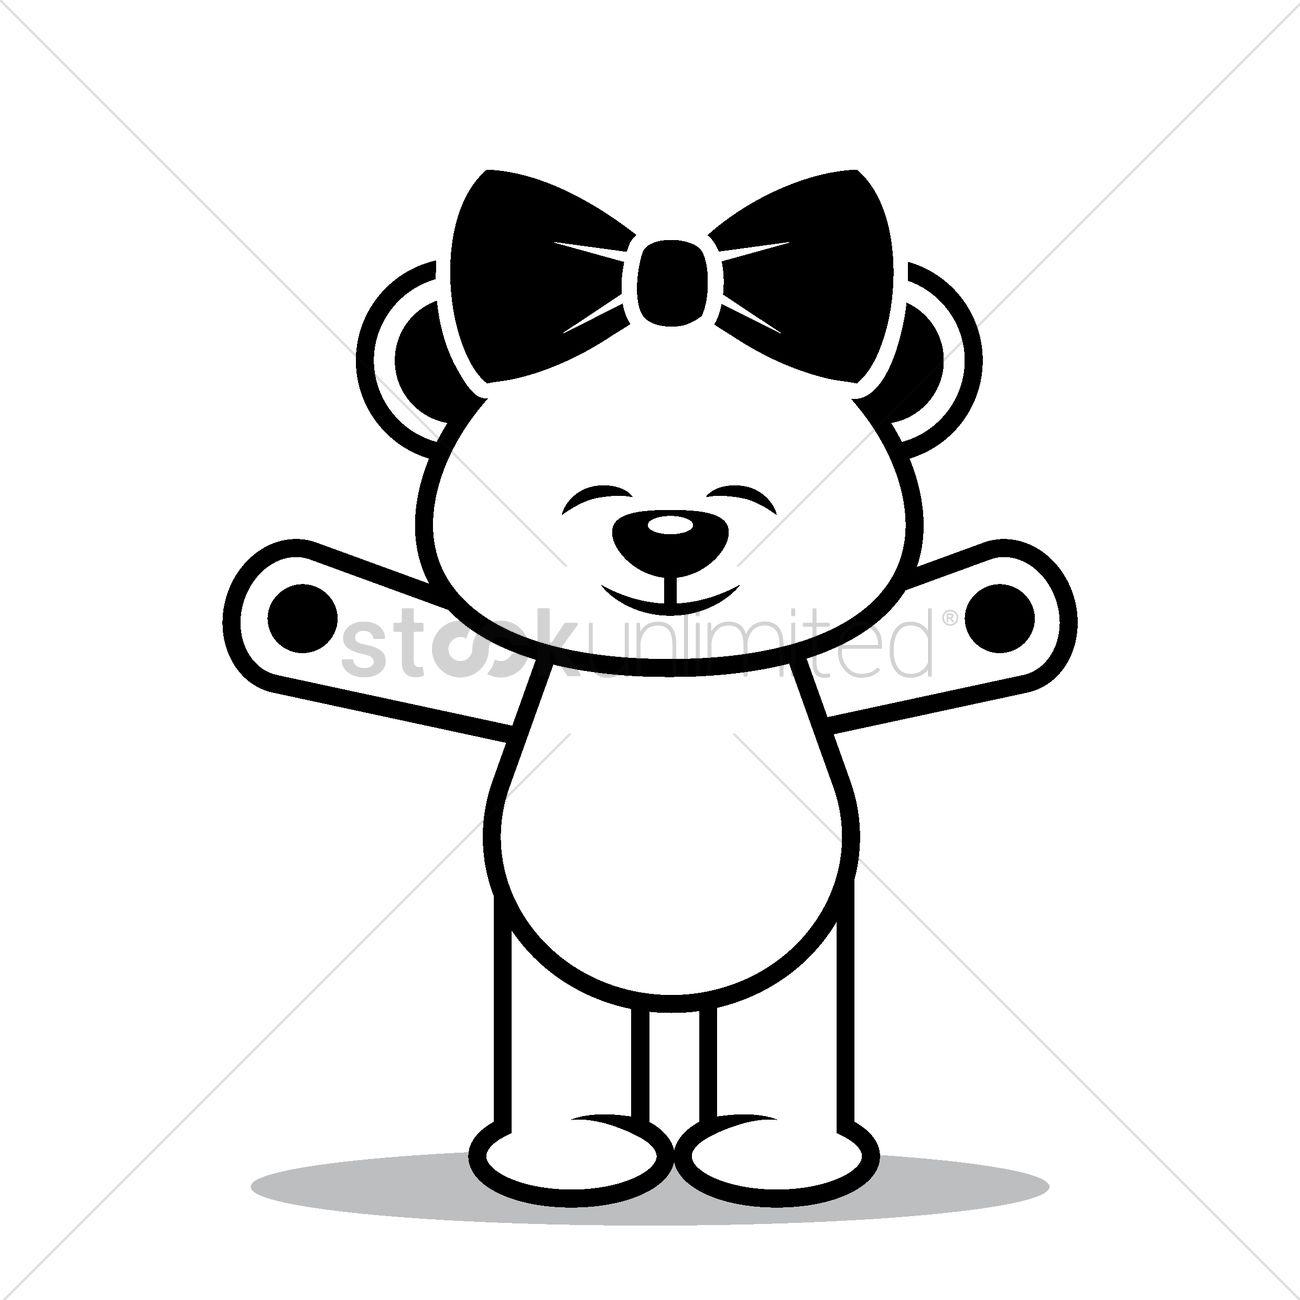 Hands Raised Teddy Bear Vector Image